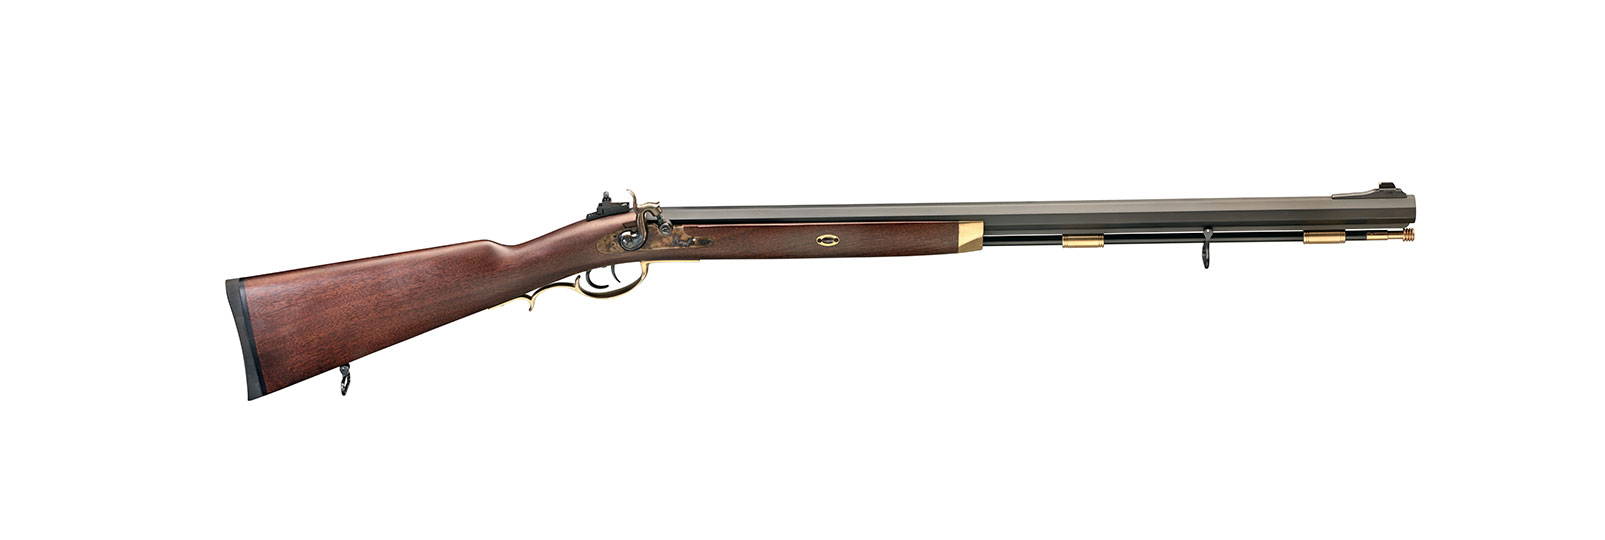 Traditional Hawken Hunter Rifle percussion model